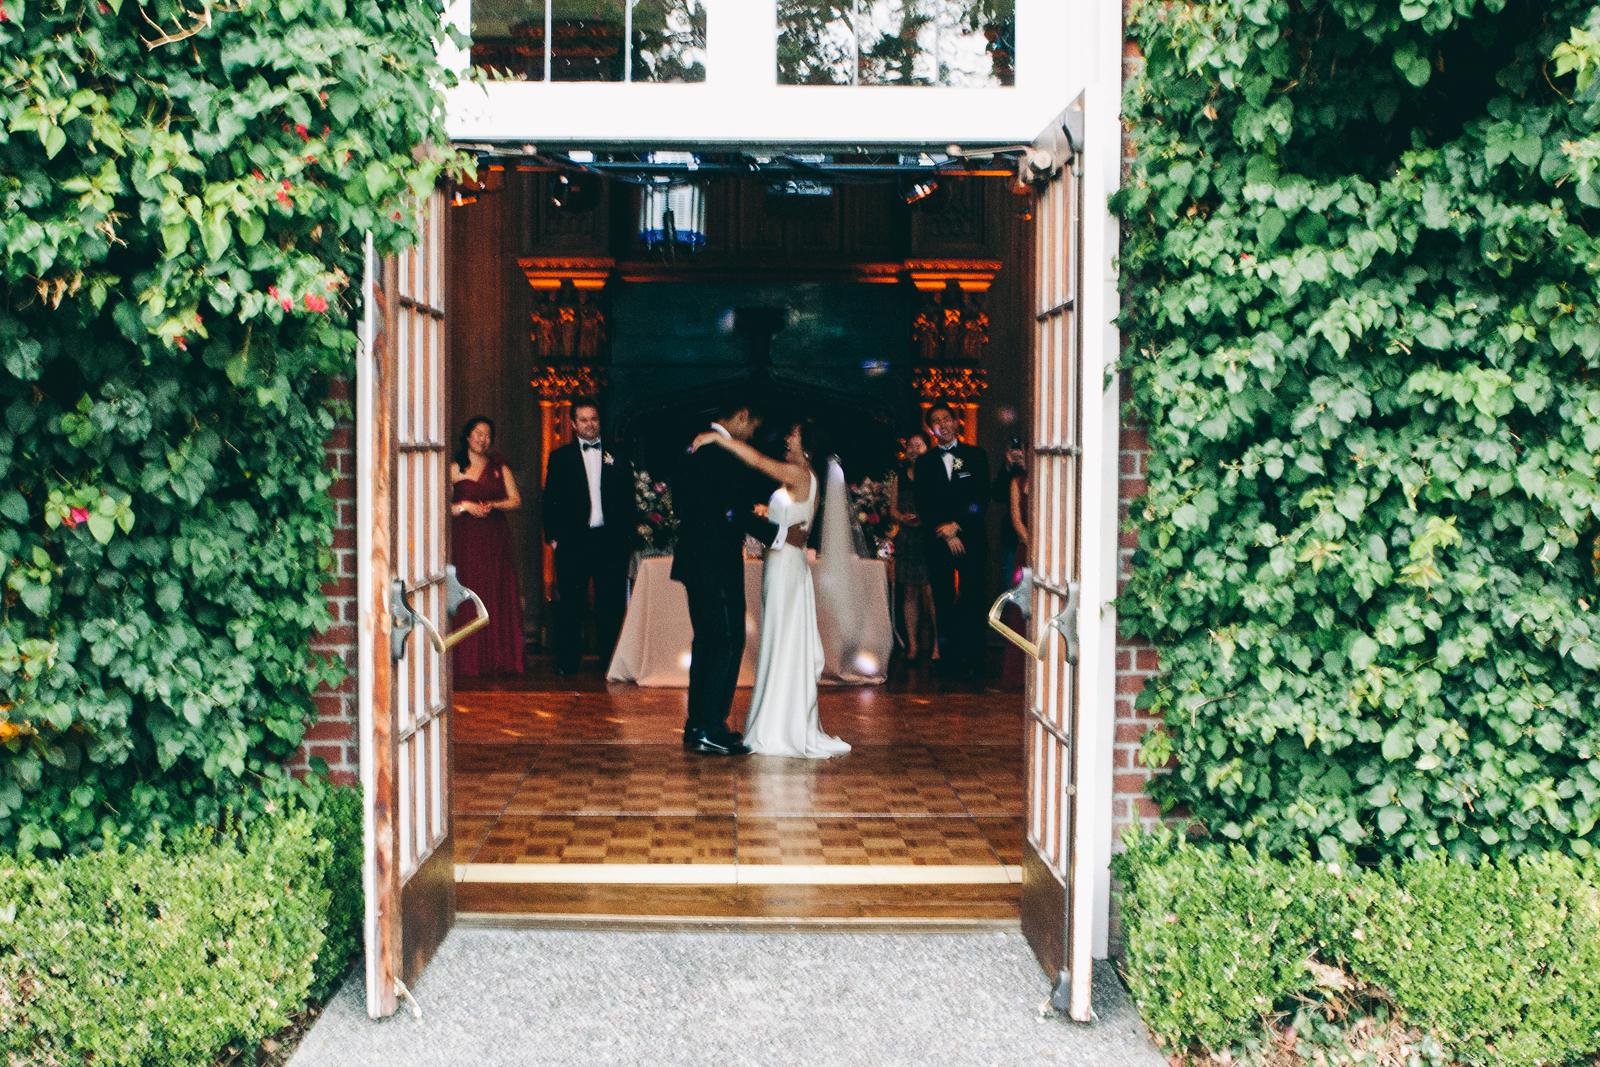 kohl_manison_wedding_photography_sarah_eric_ebony_siovhan_bokeh_photography_085.jpg